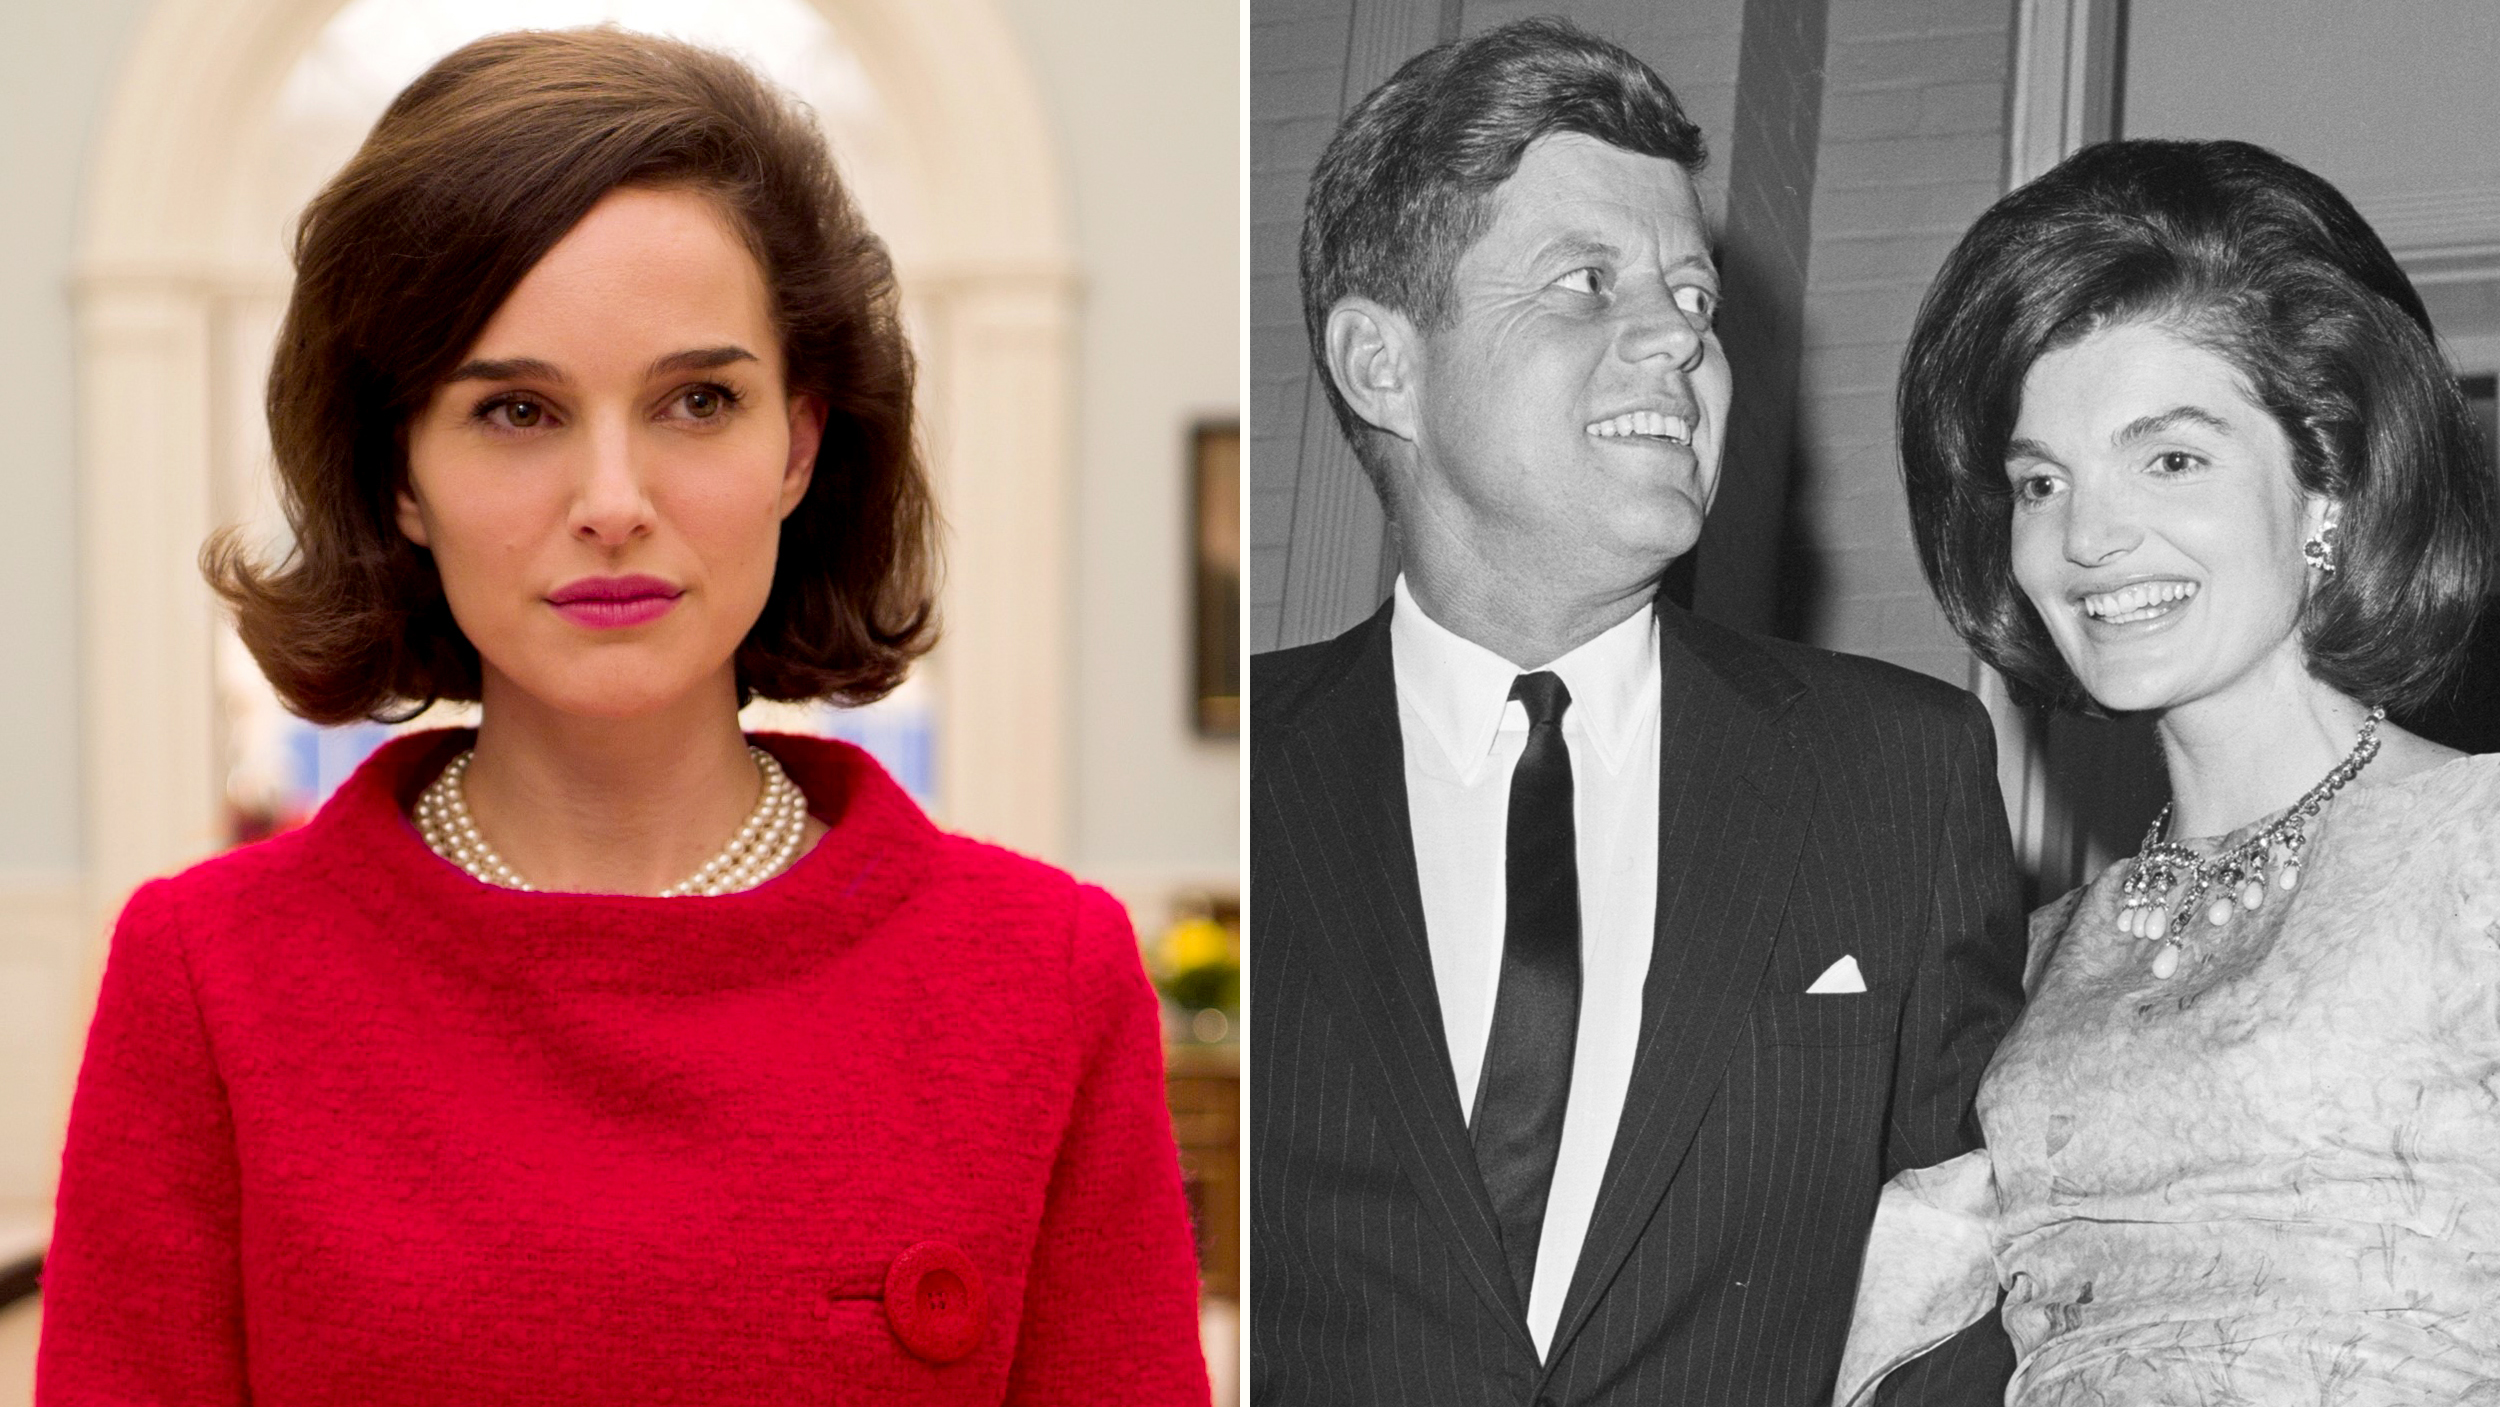 Natalie Portman reveals how Jackie Kennedy created 'Camelot